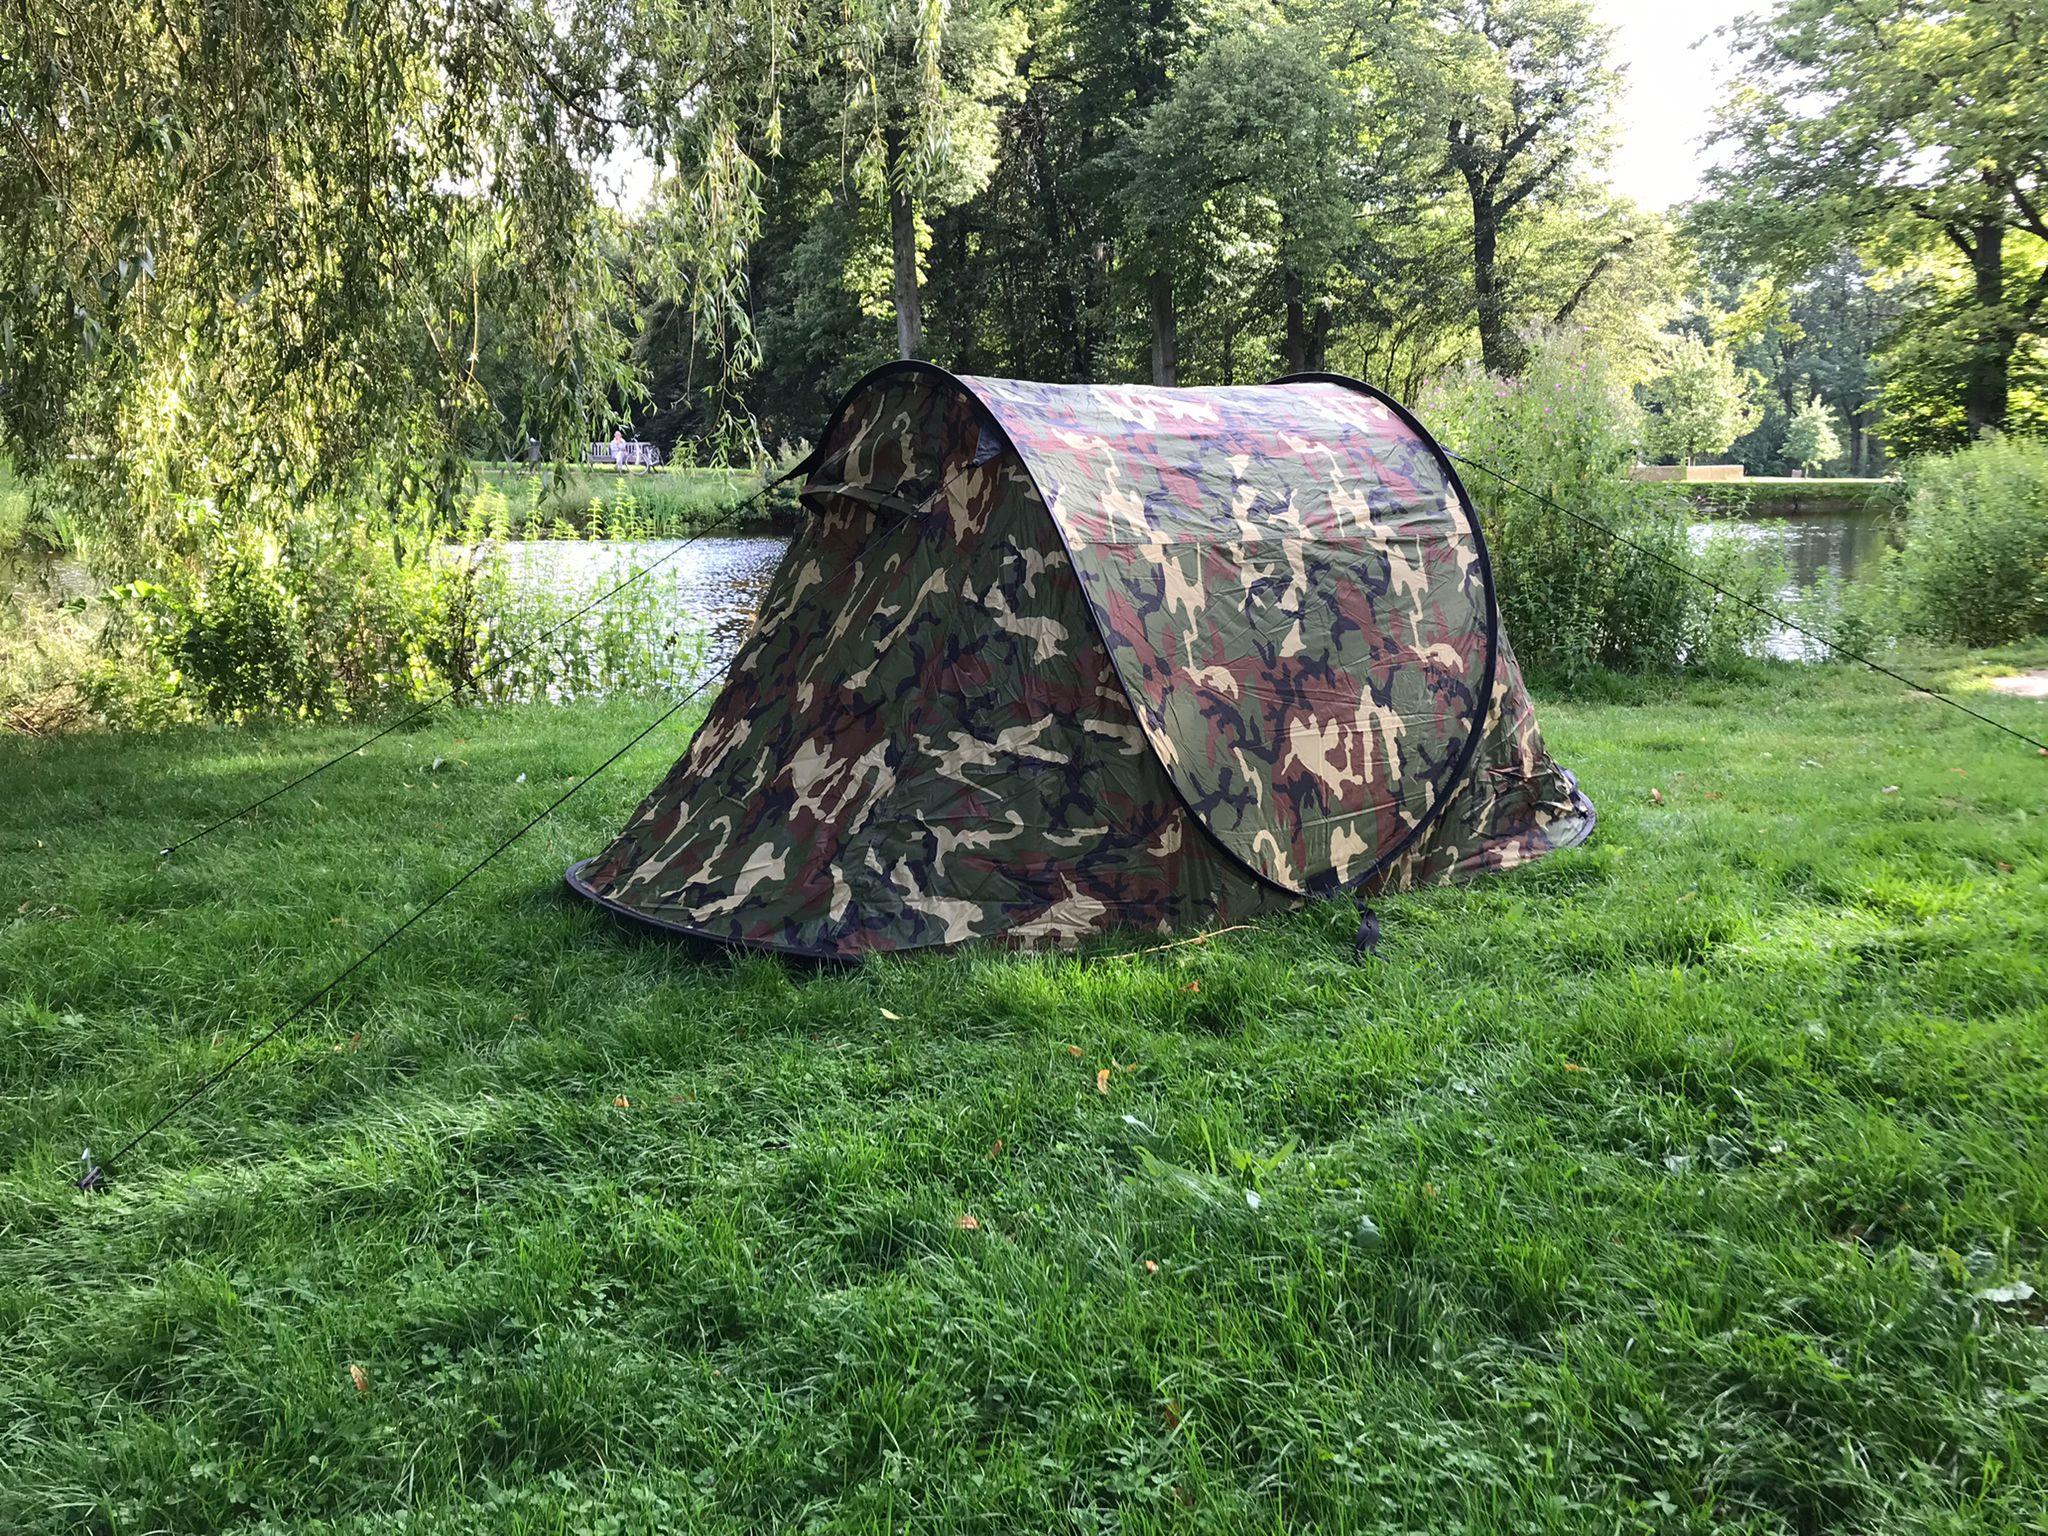 Wurfzelt Sekundenzelt 2-3 Person Outdoor Campingzelt Tent Pop Up 245x145x110cm Camouflage